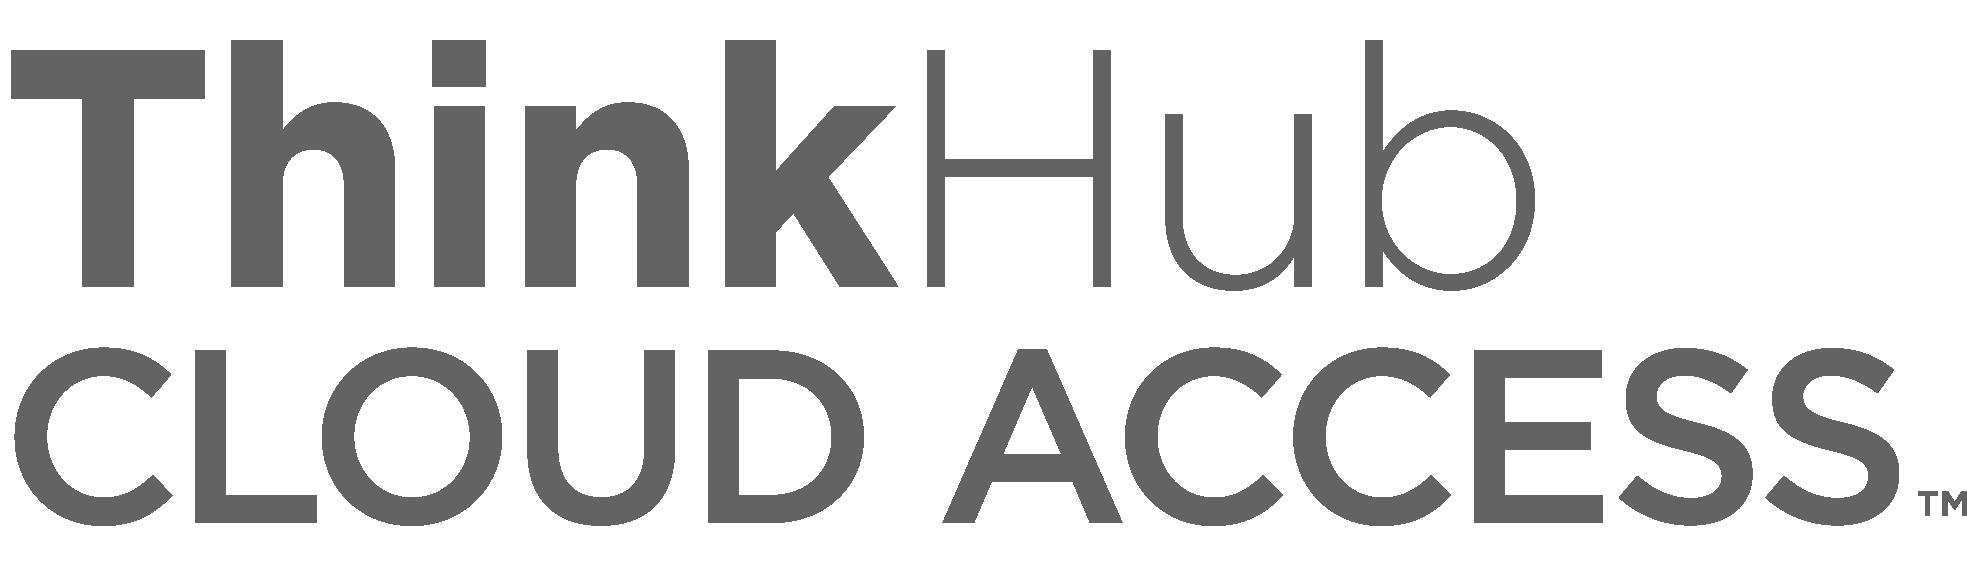 T1V-ThinkHub-Cloud-Access-Logo-Stacked-Dark-Grey